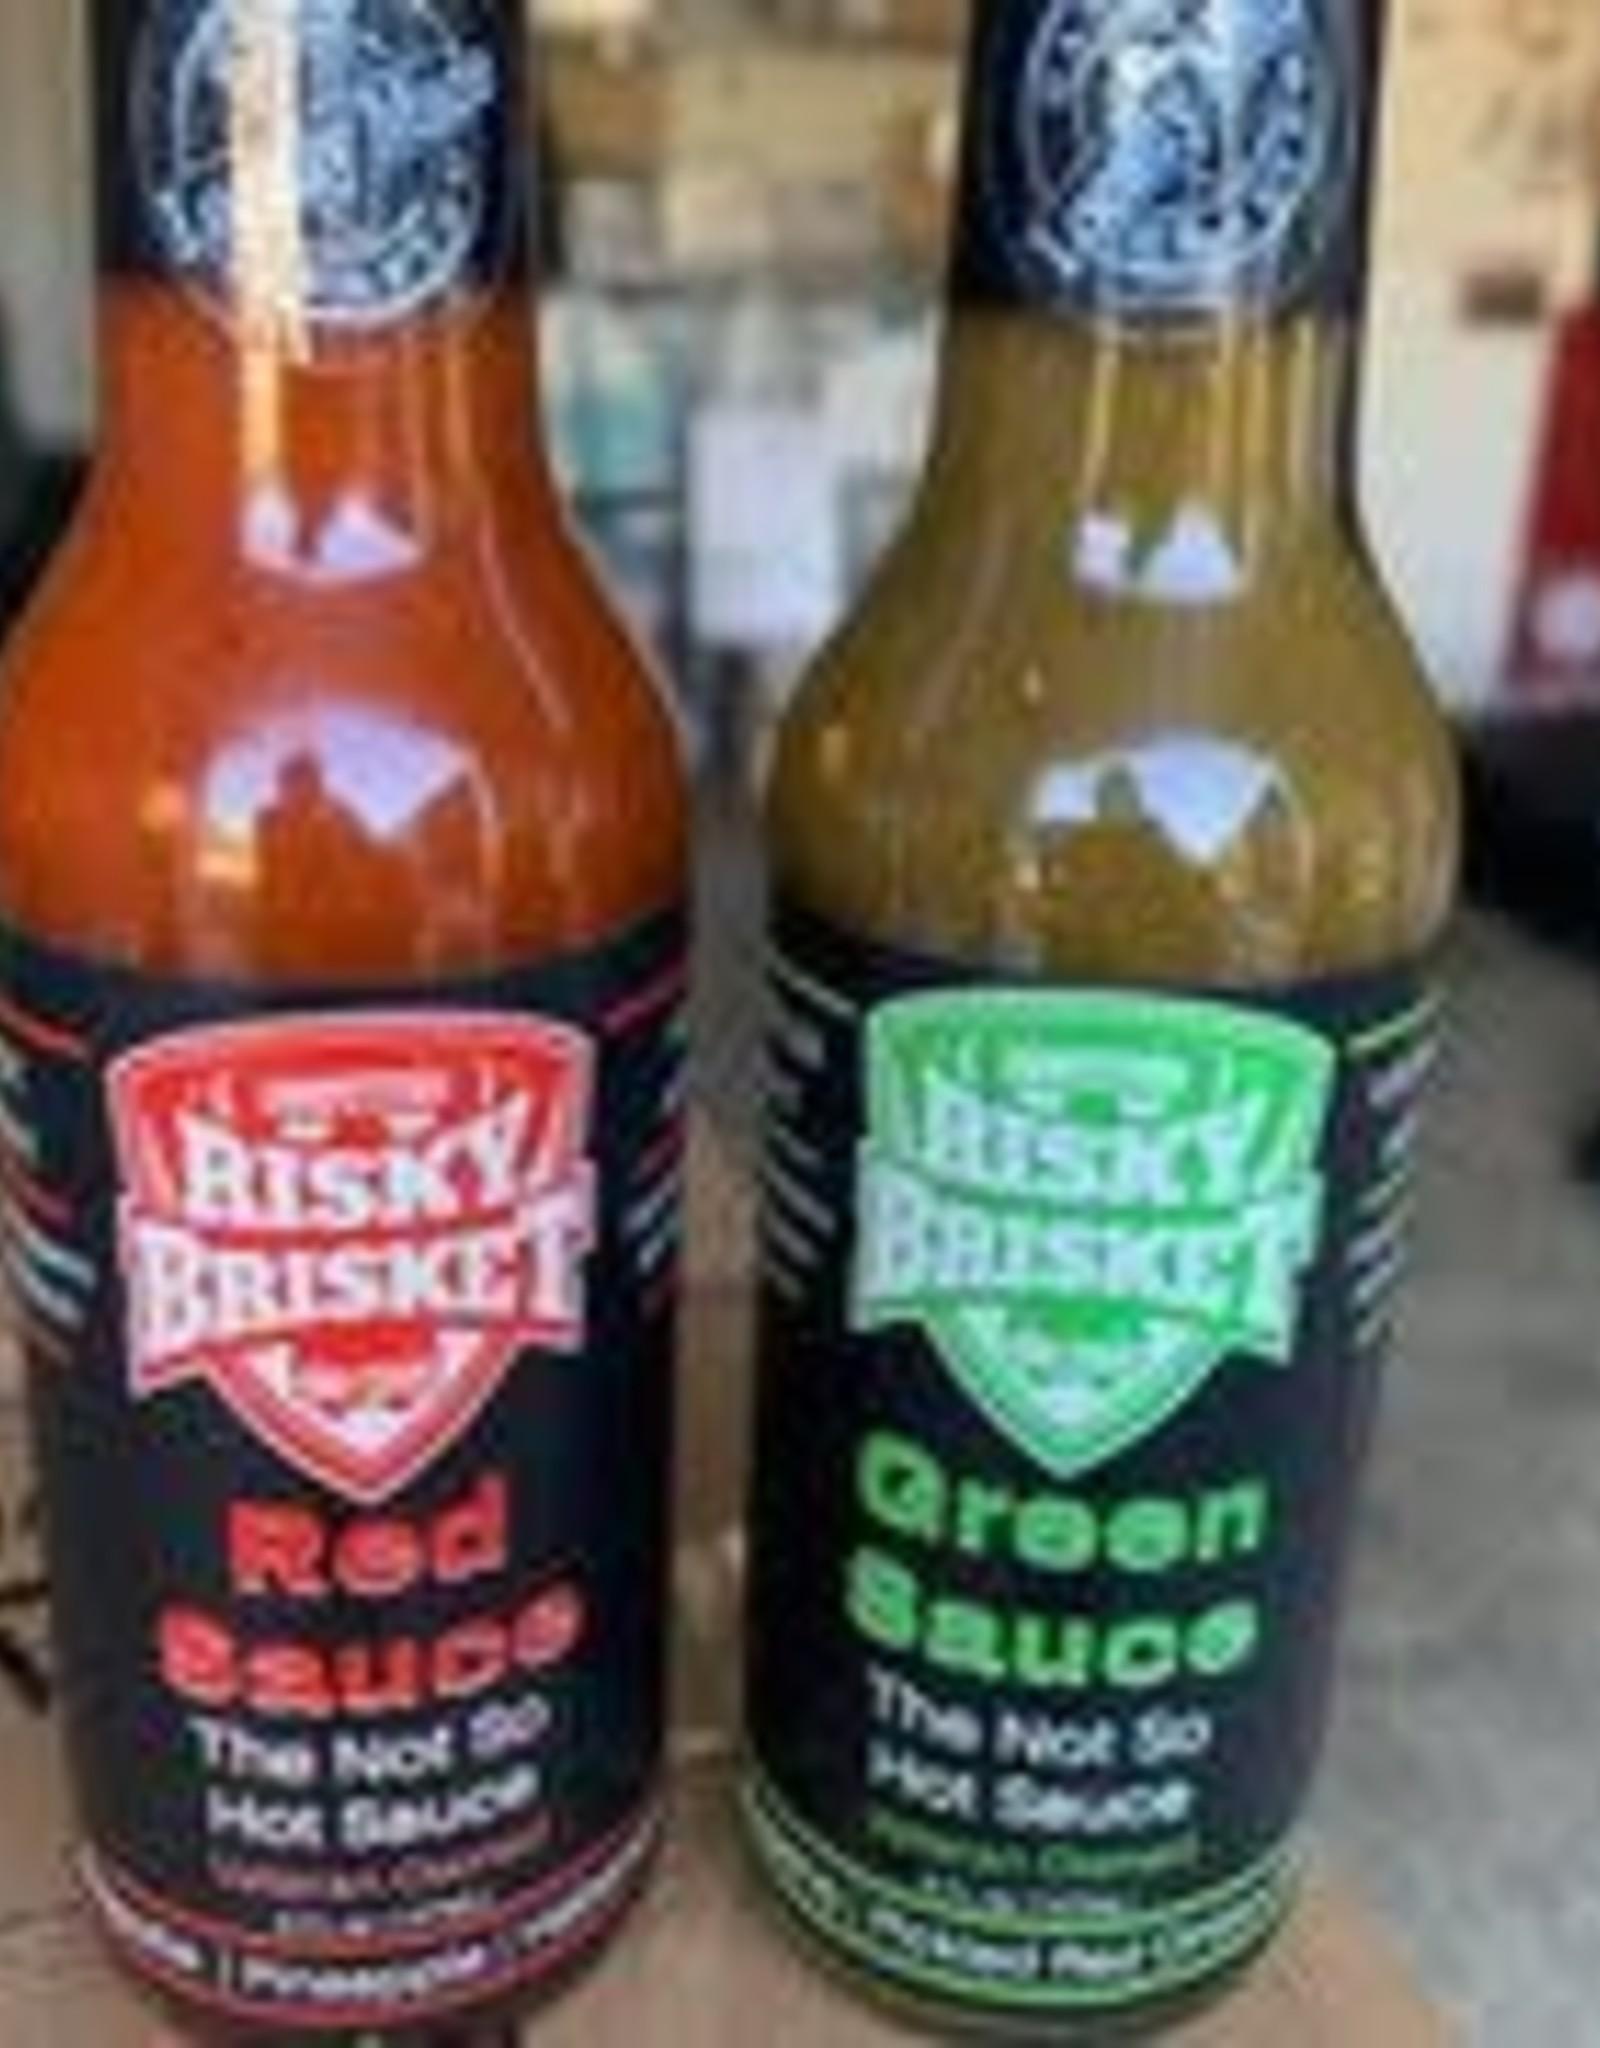 Risky Brisket Red Sauce